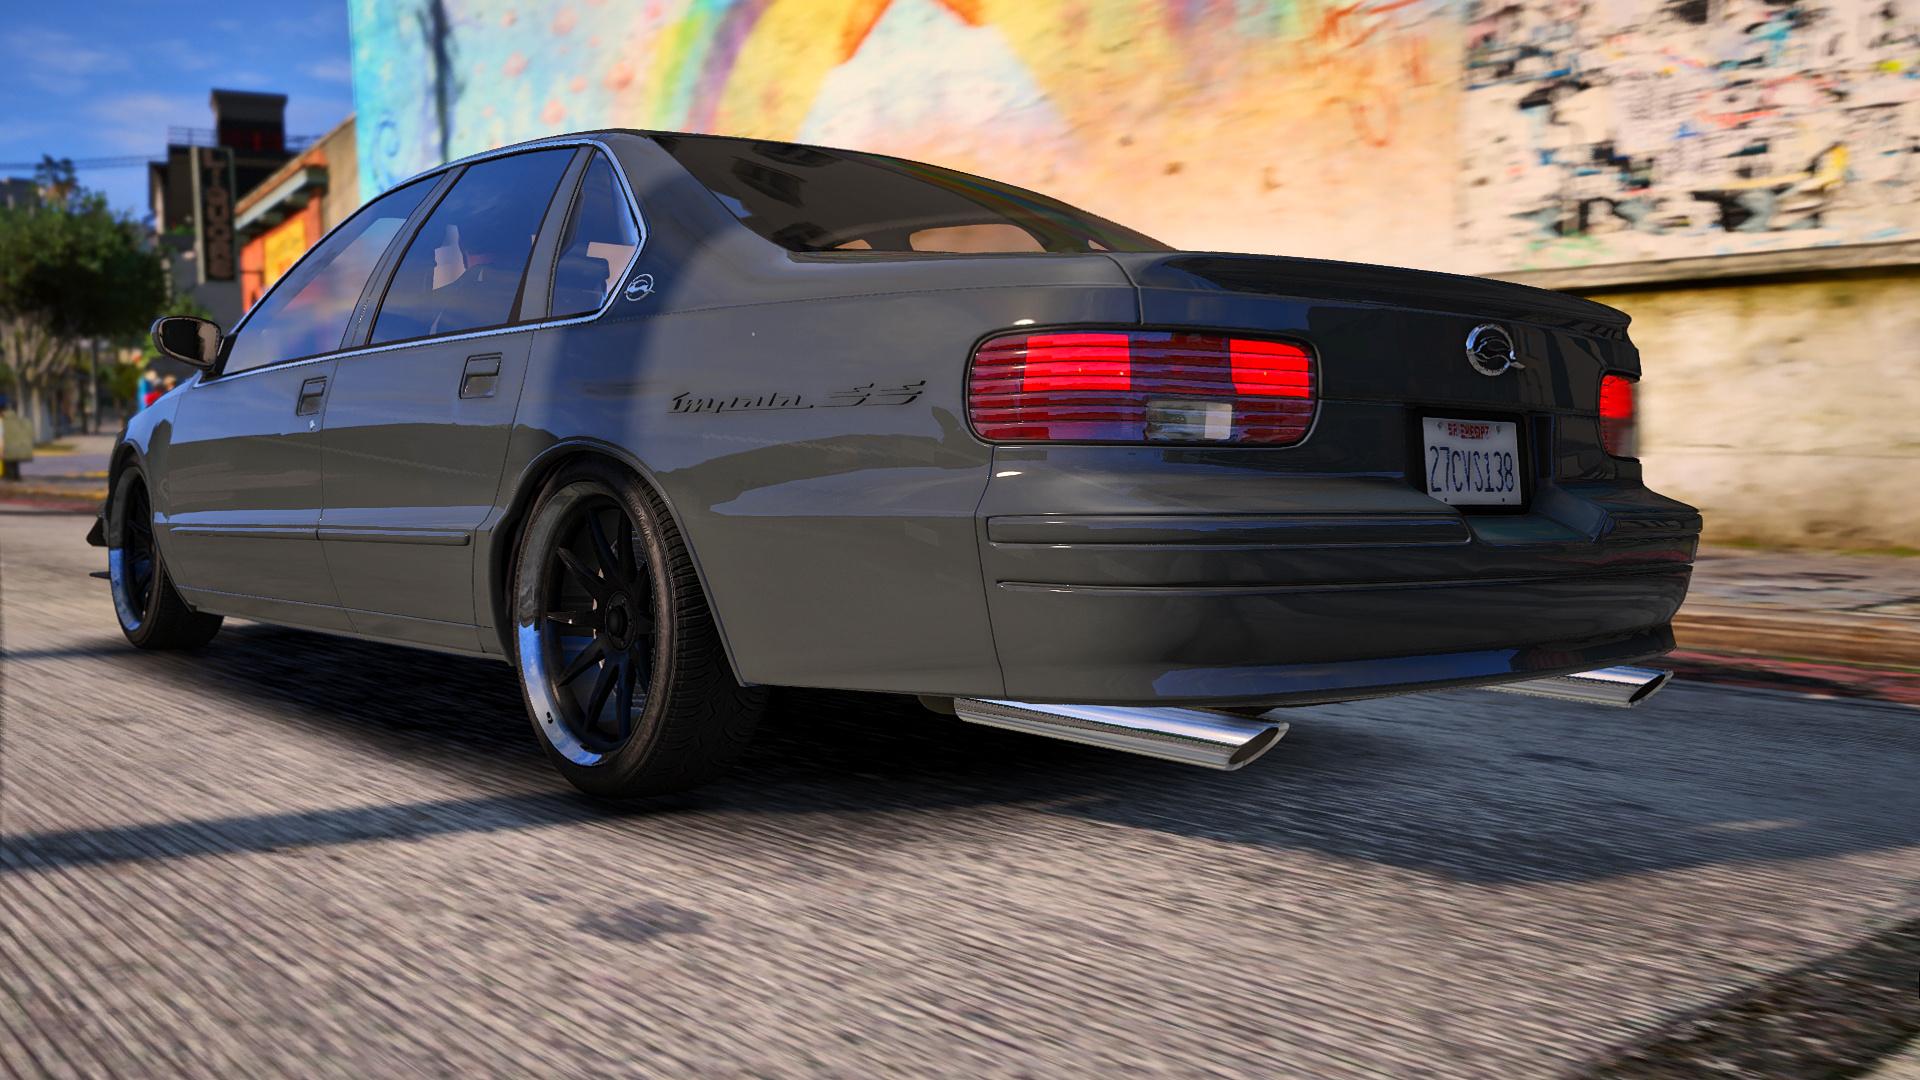 1996 Chevrolet Impala SS [Add-On | Tuning] - GTA5-Mods.com